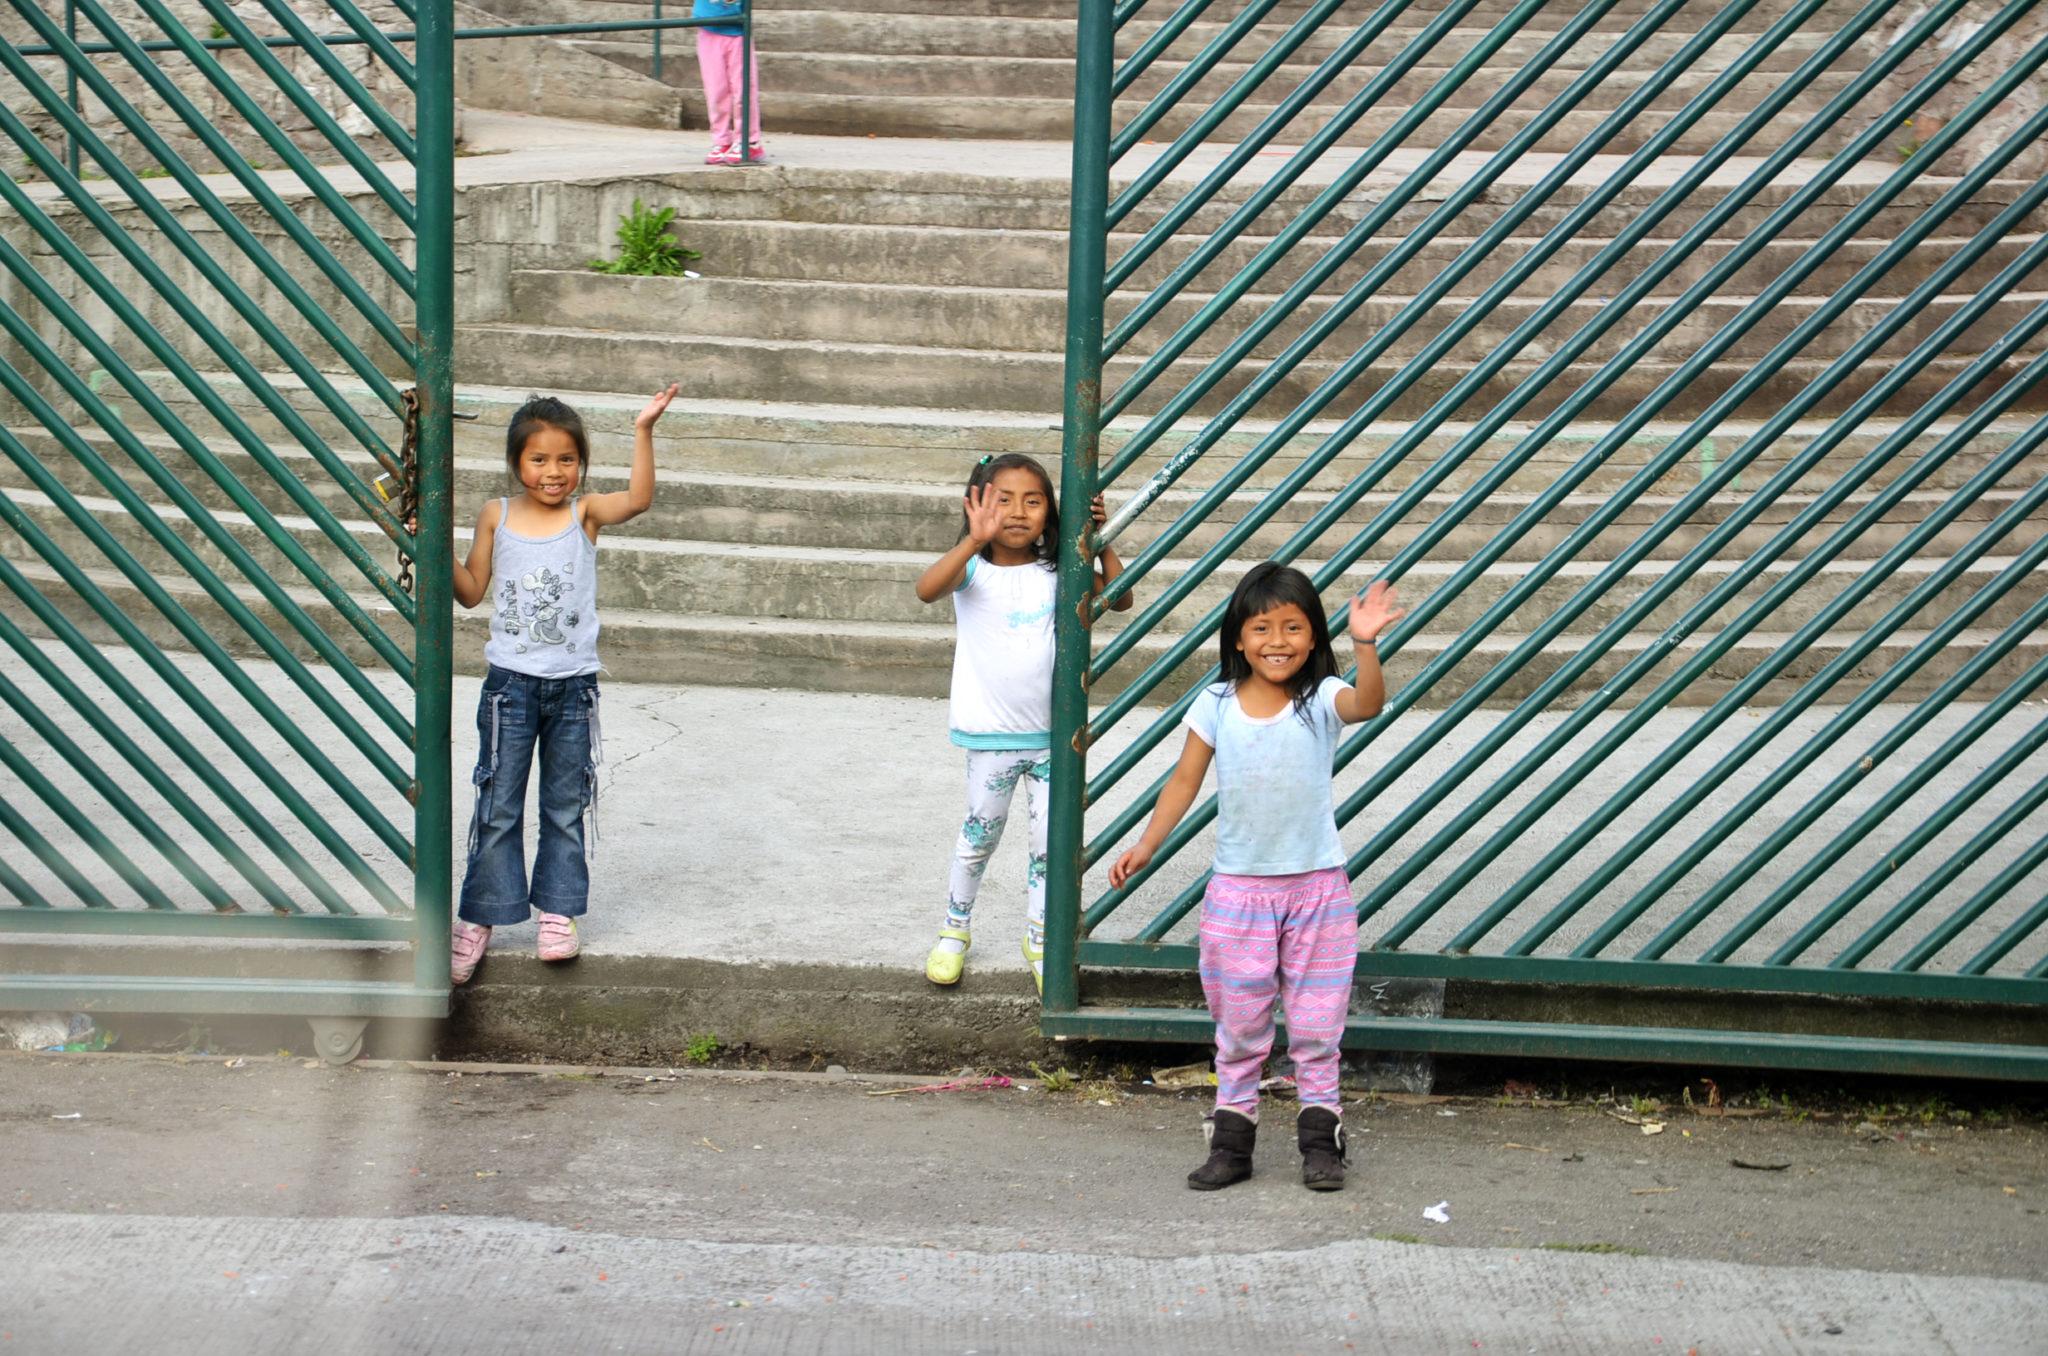 Sehenswuerdigkeiten-Ecuador-Kinder